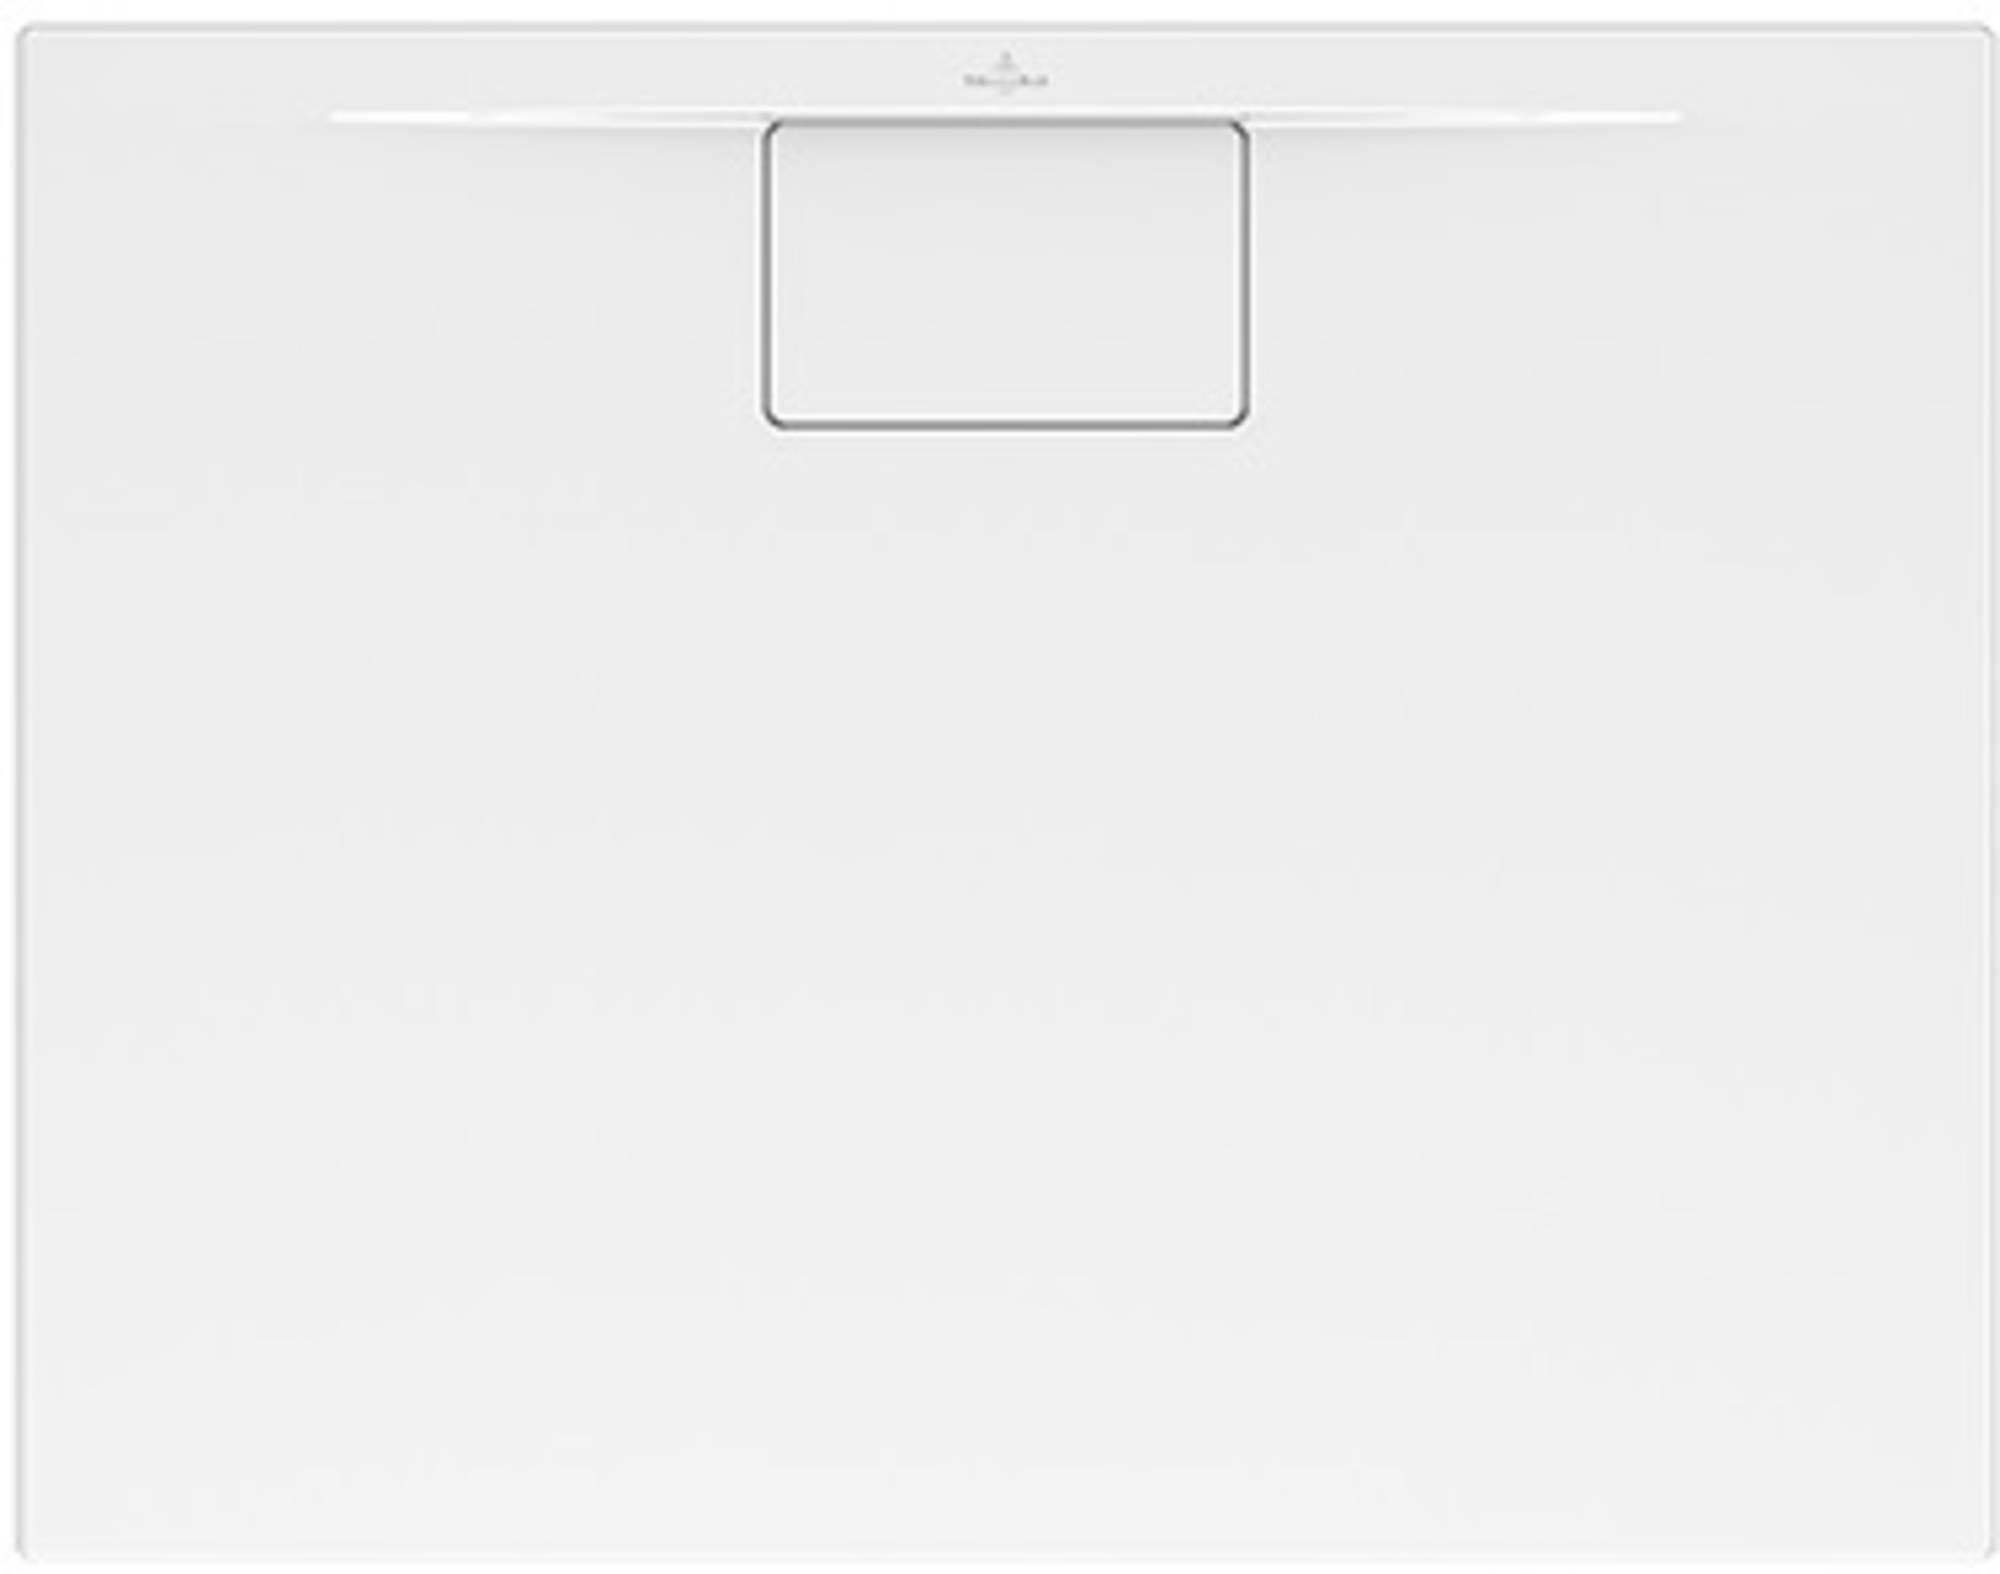 Villeroy & boch Architectura metal rim douchebak 90x80x4.8 cm, wit